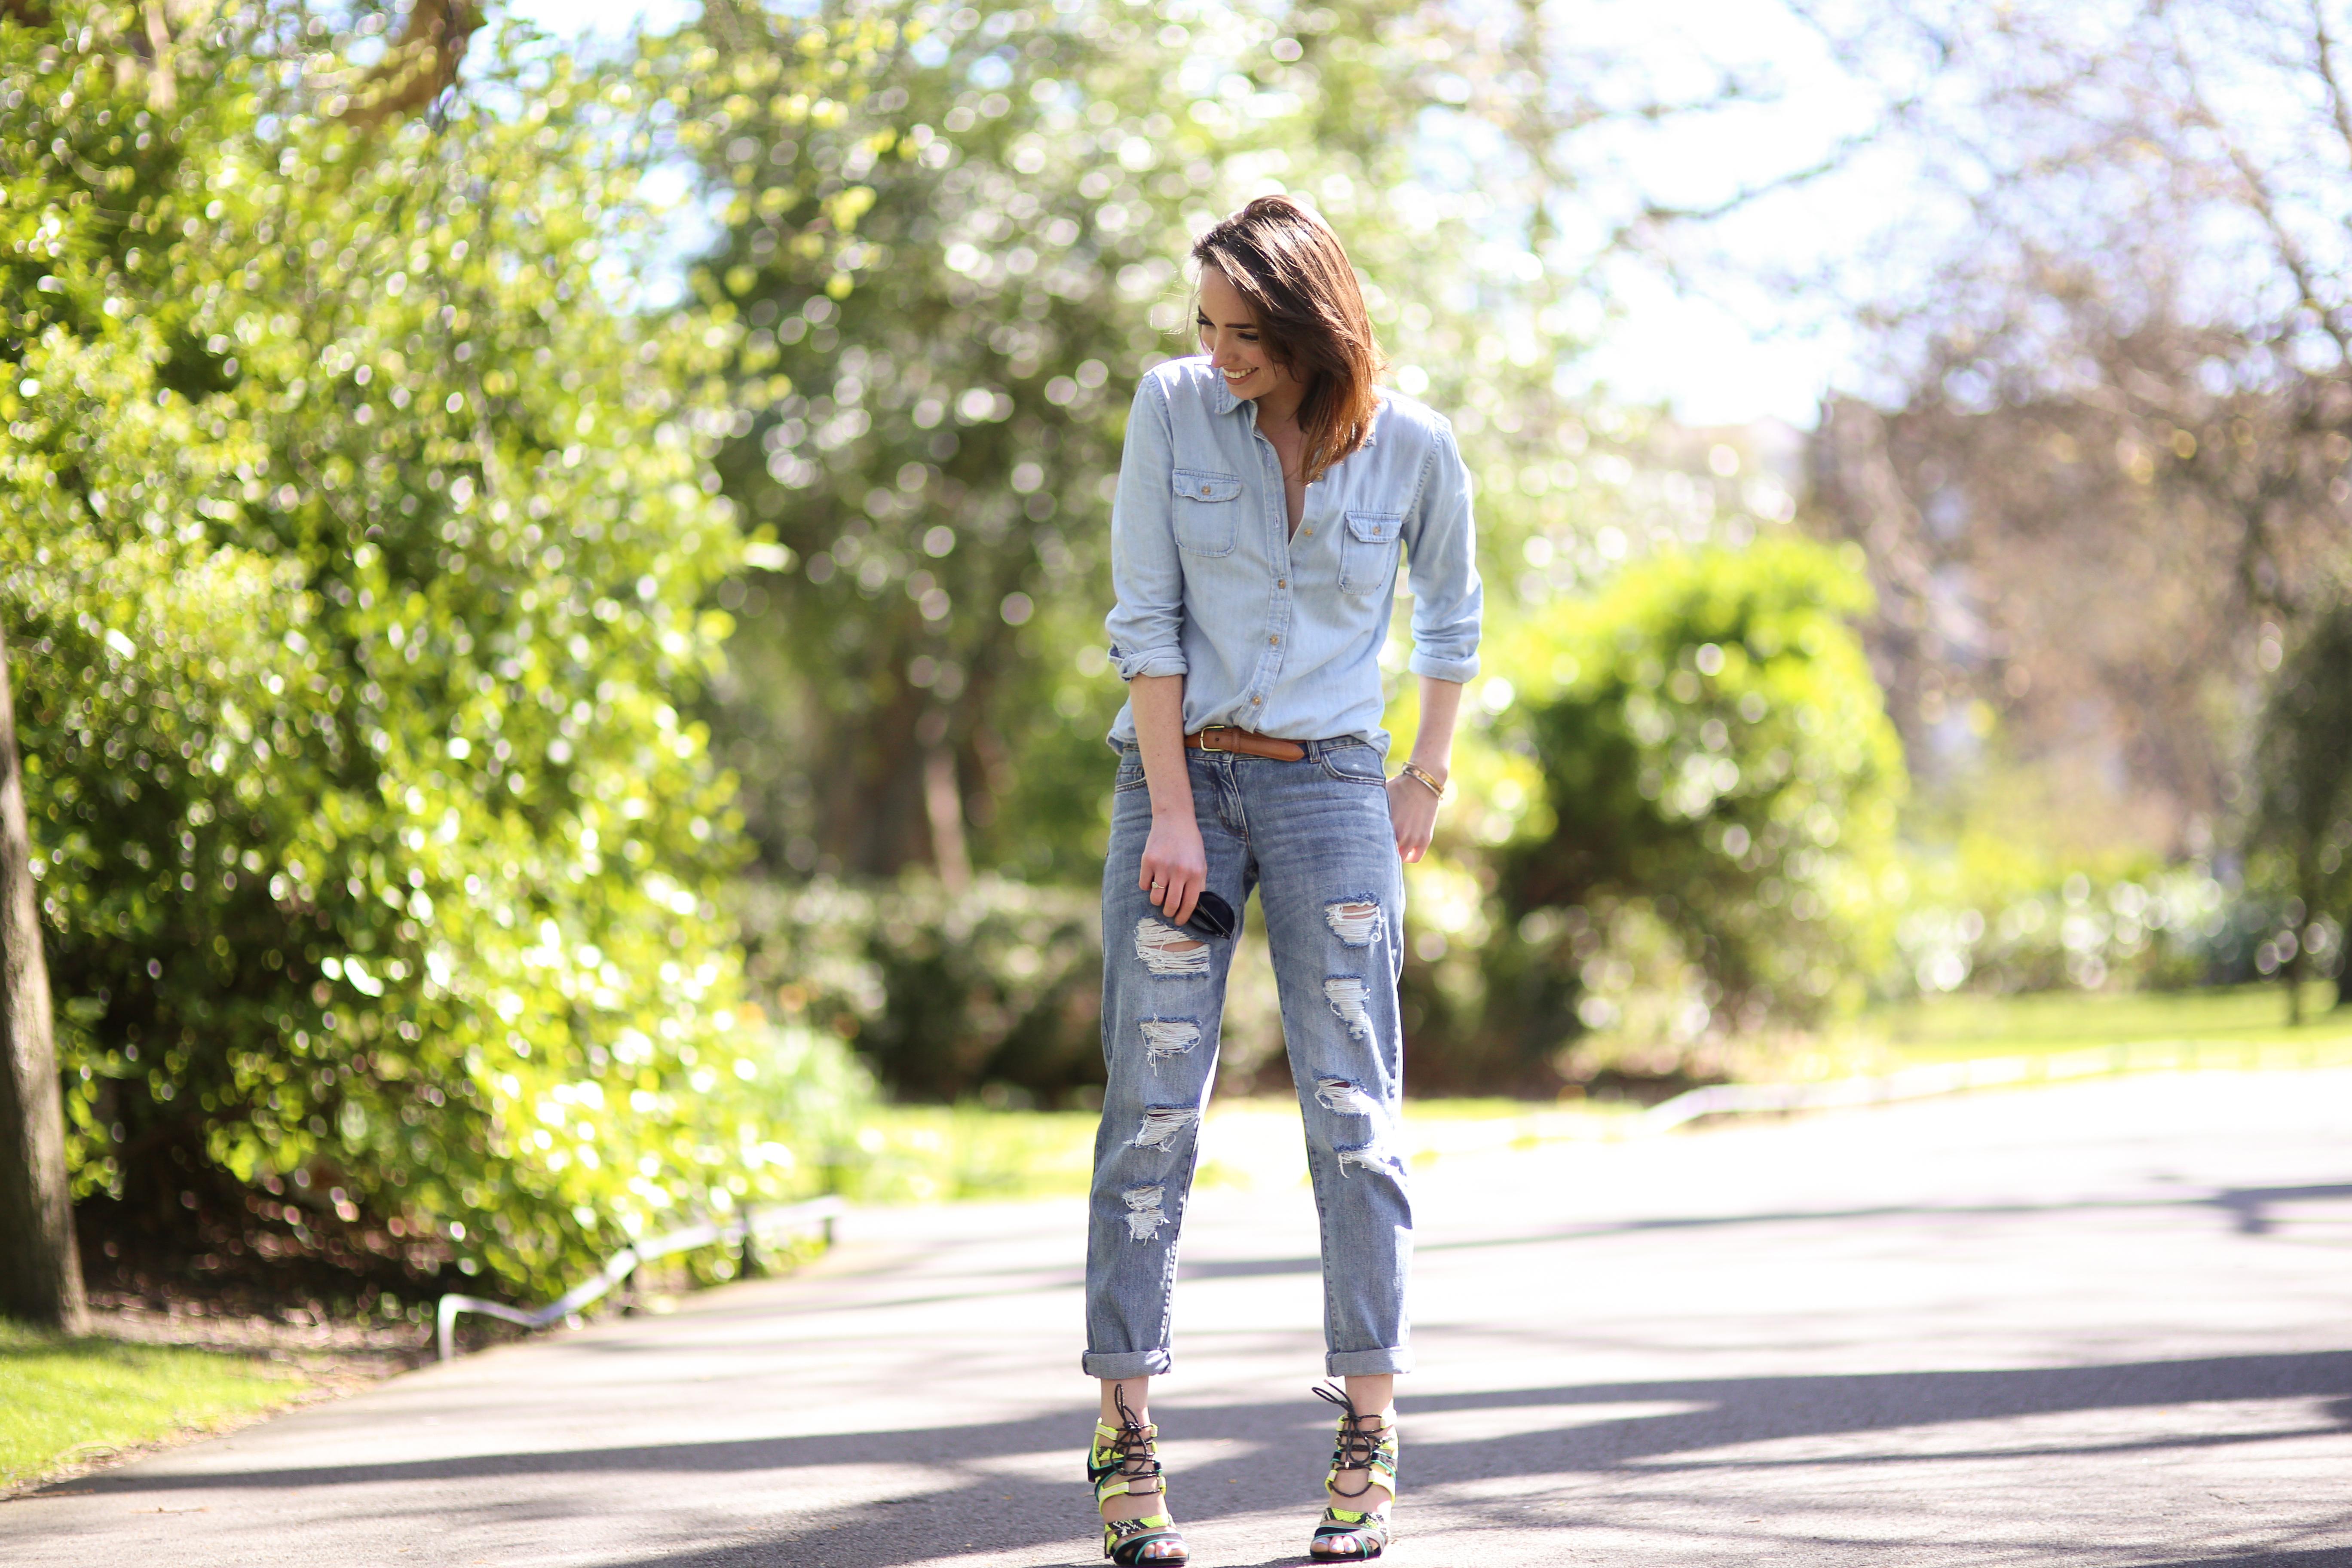 Style Diary: The Boyfriend Jean